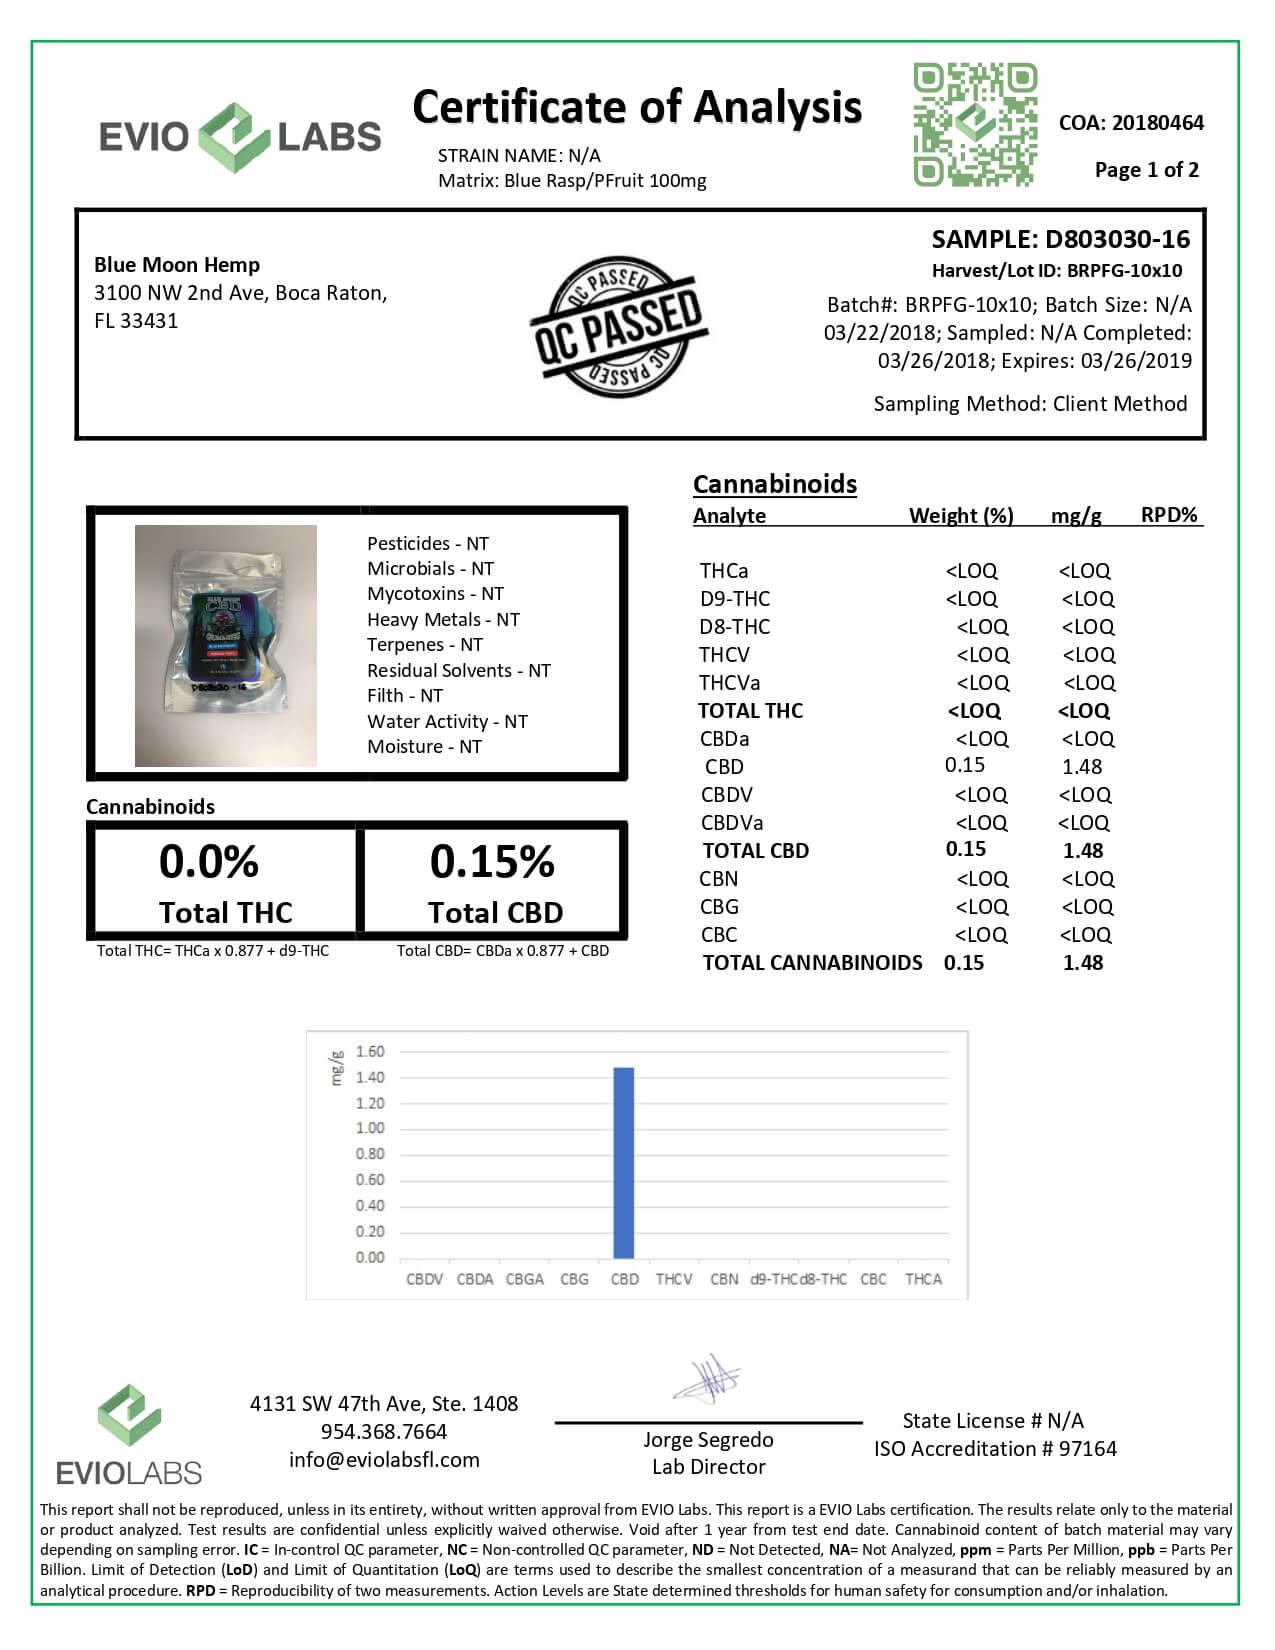 Blue Moon Hemp CBD Edible Gummies 1oz-50mg Lab Report